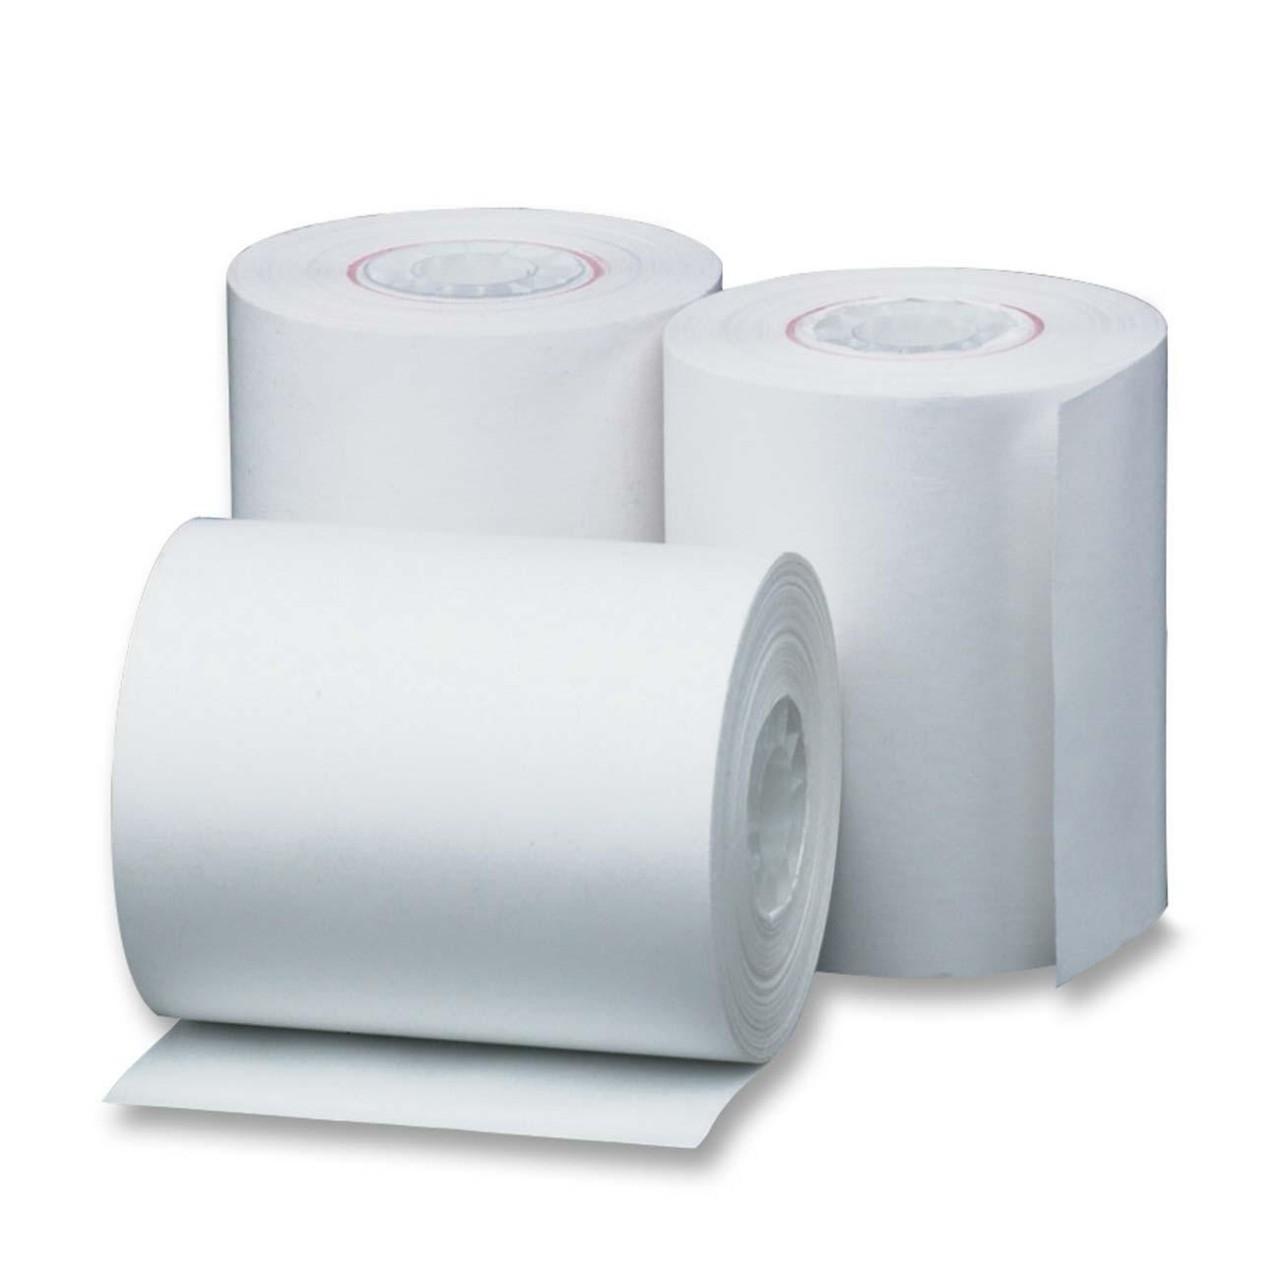 Mobi Print Receipt Paper